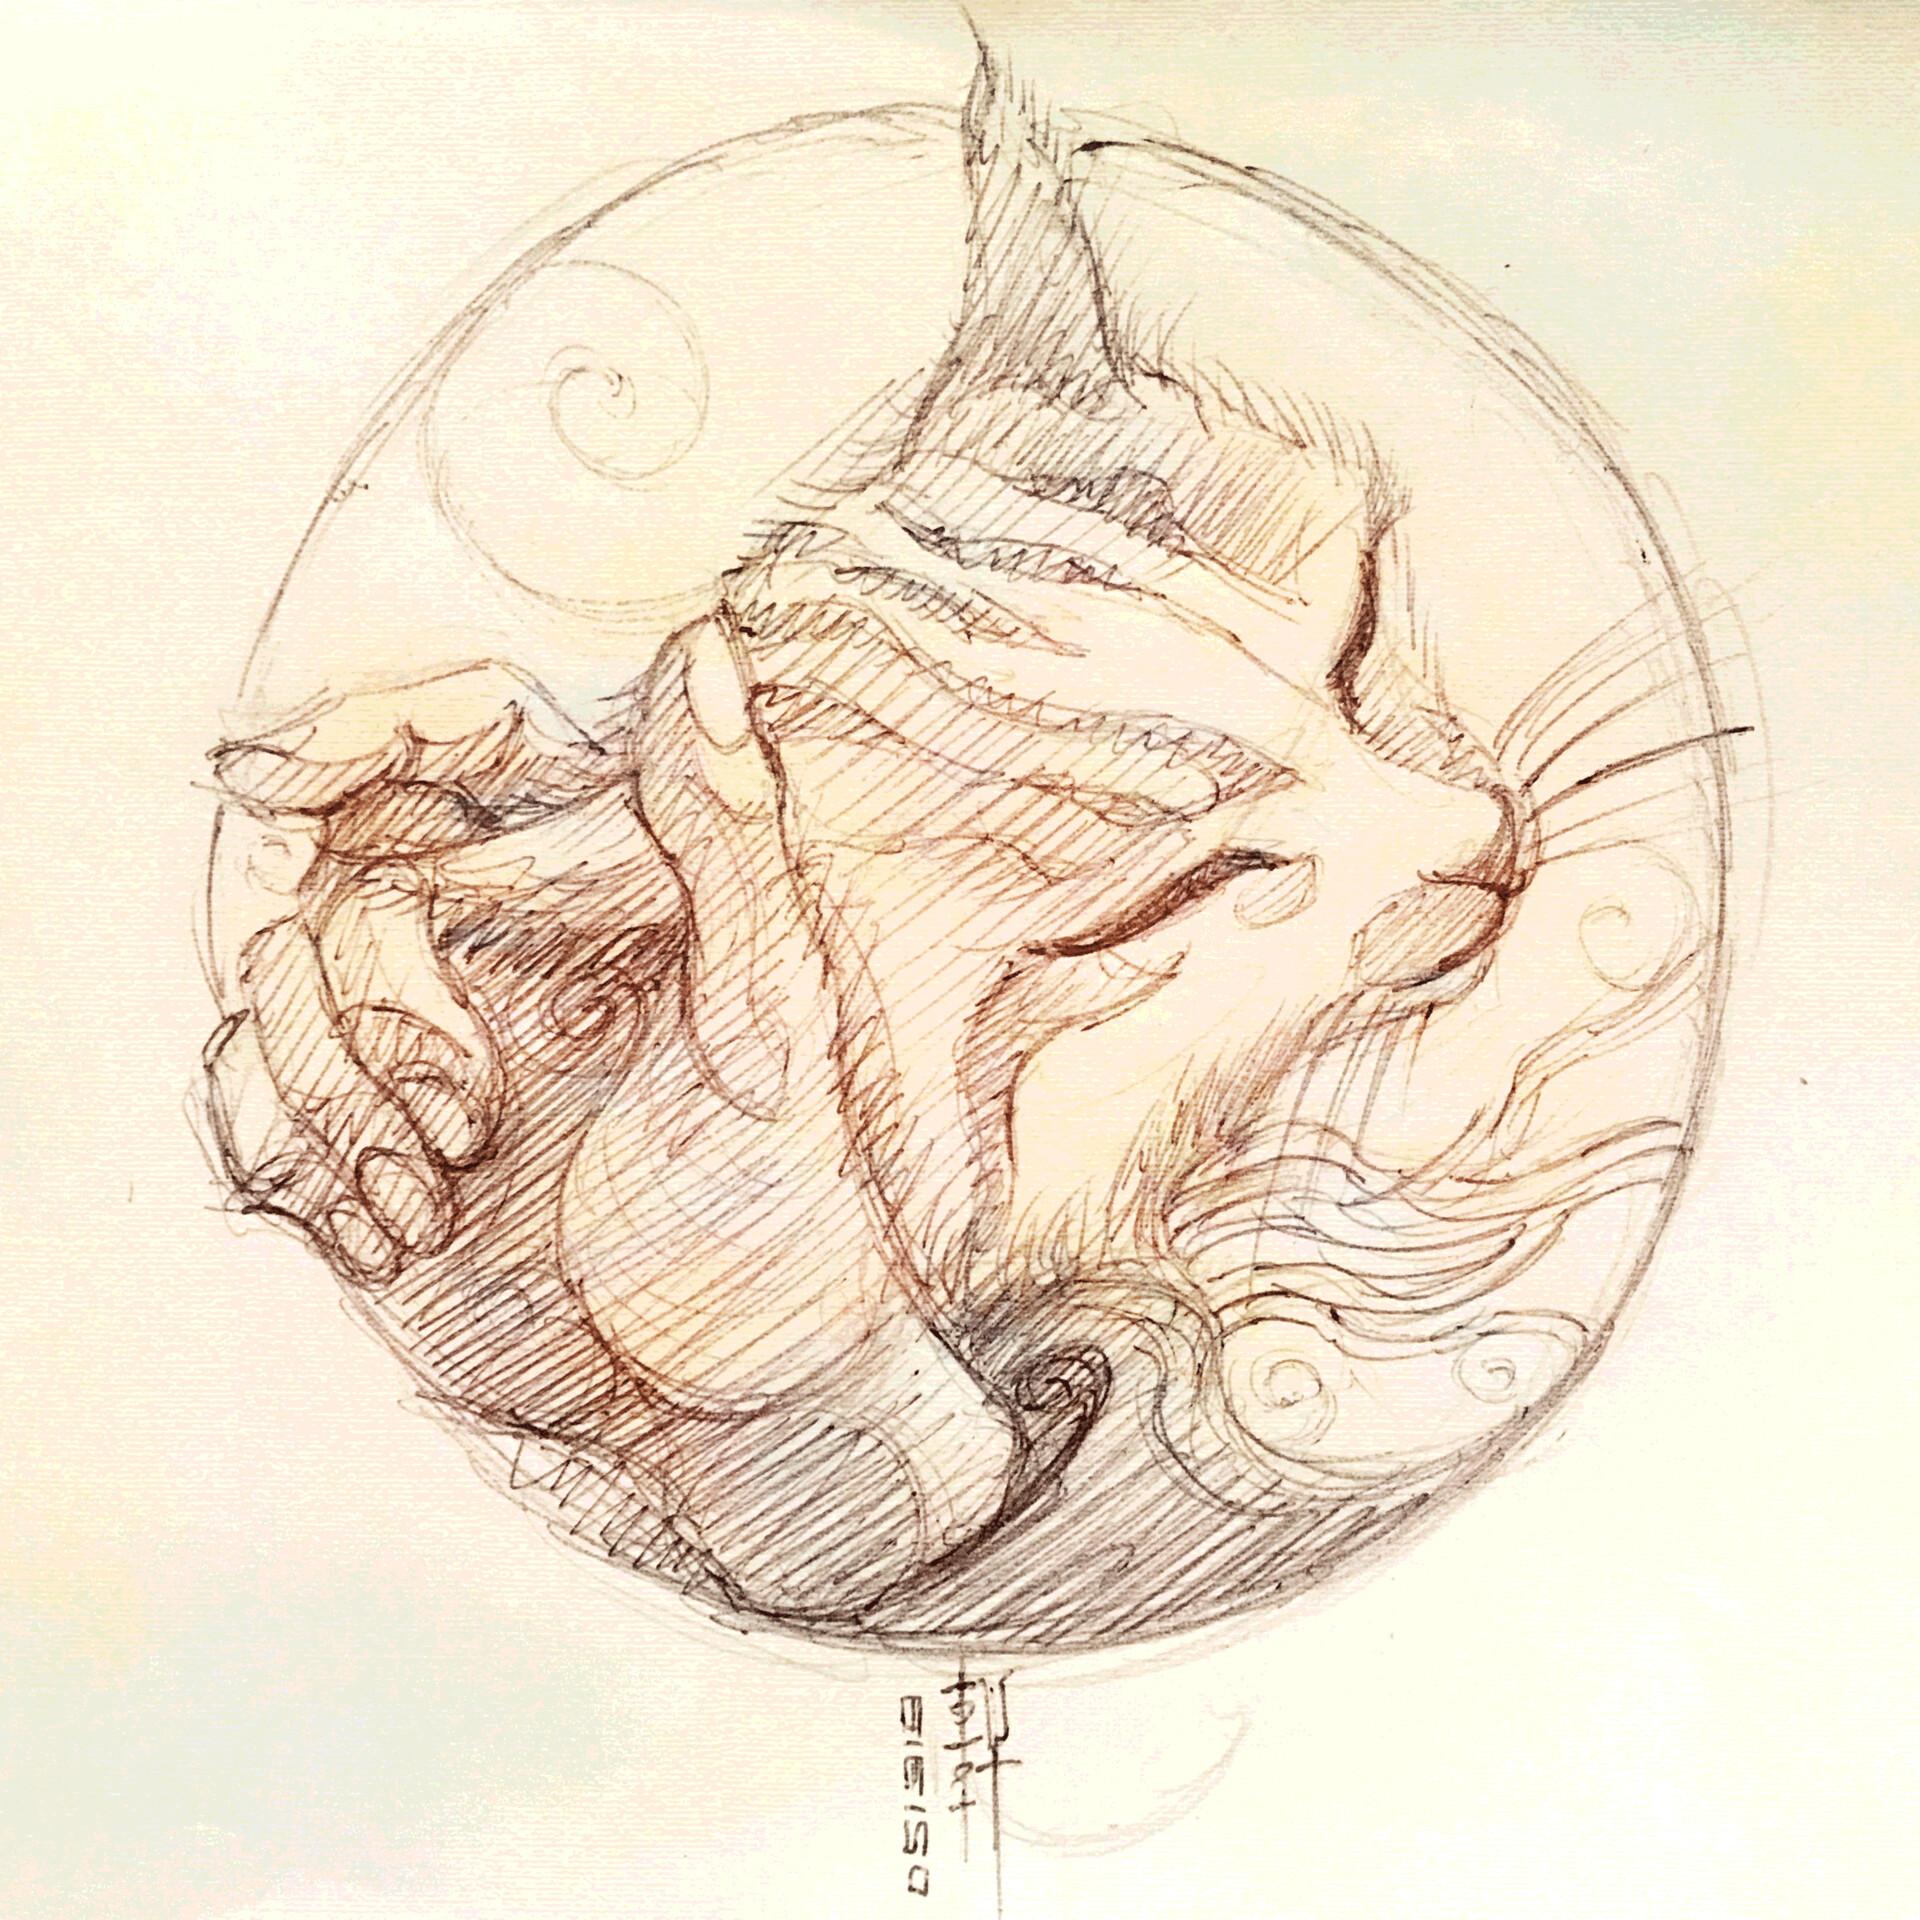 Cuddly Vi - Sketch